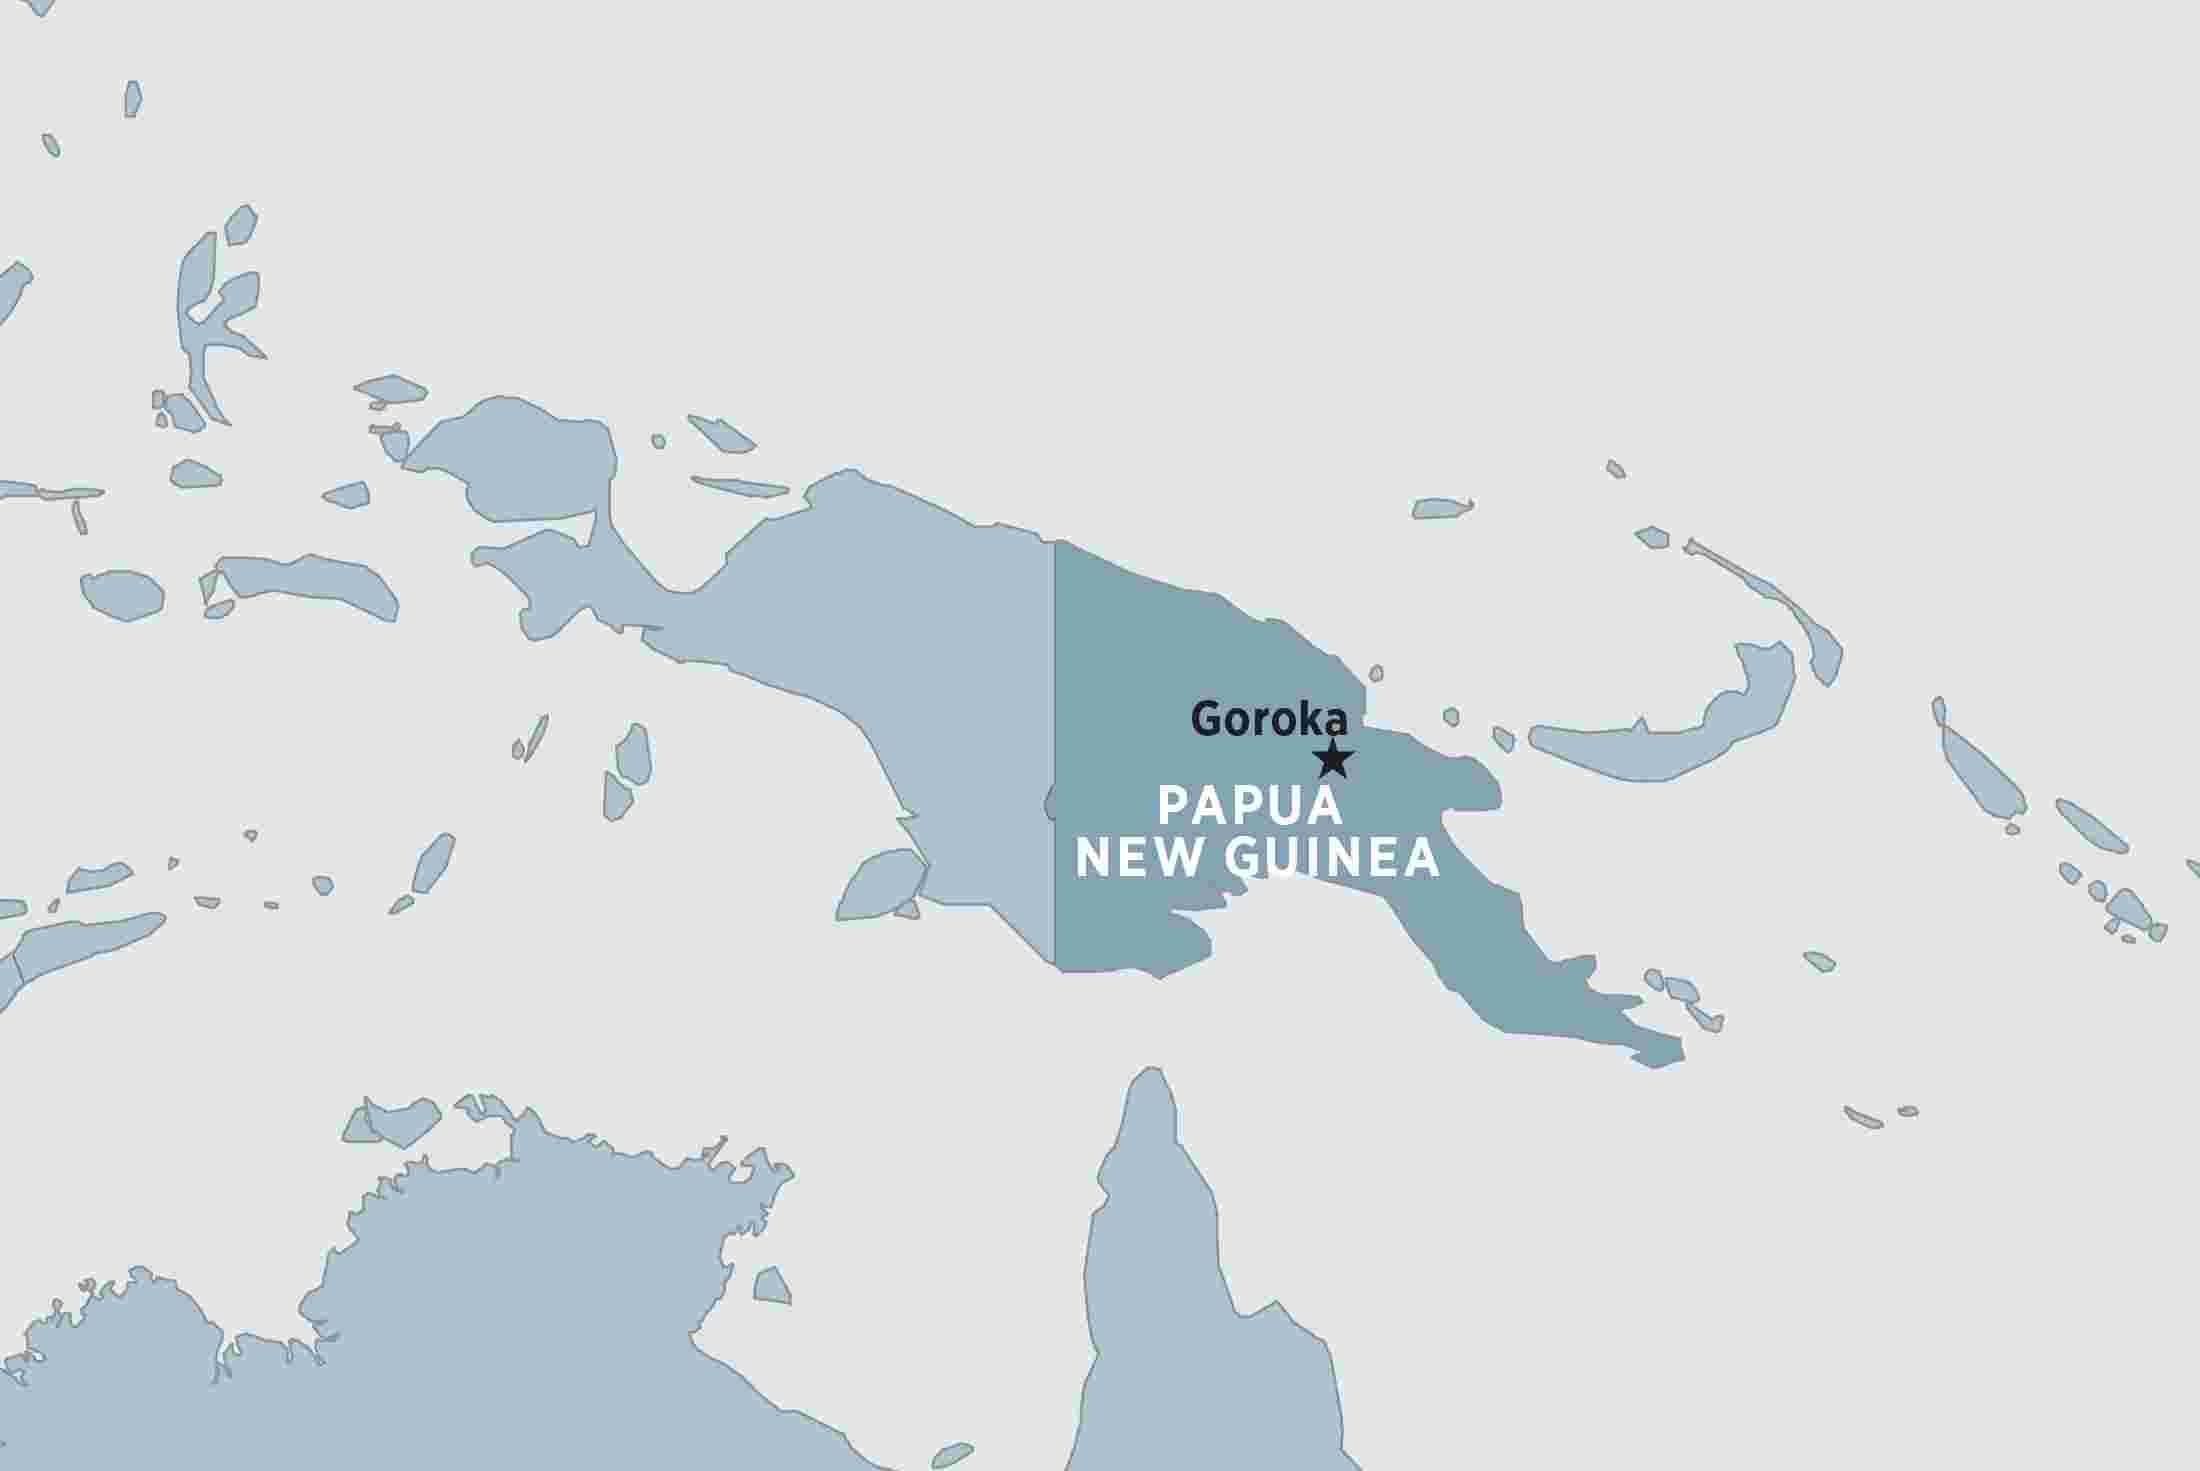 Goroka Show, Papua New Guinea.